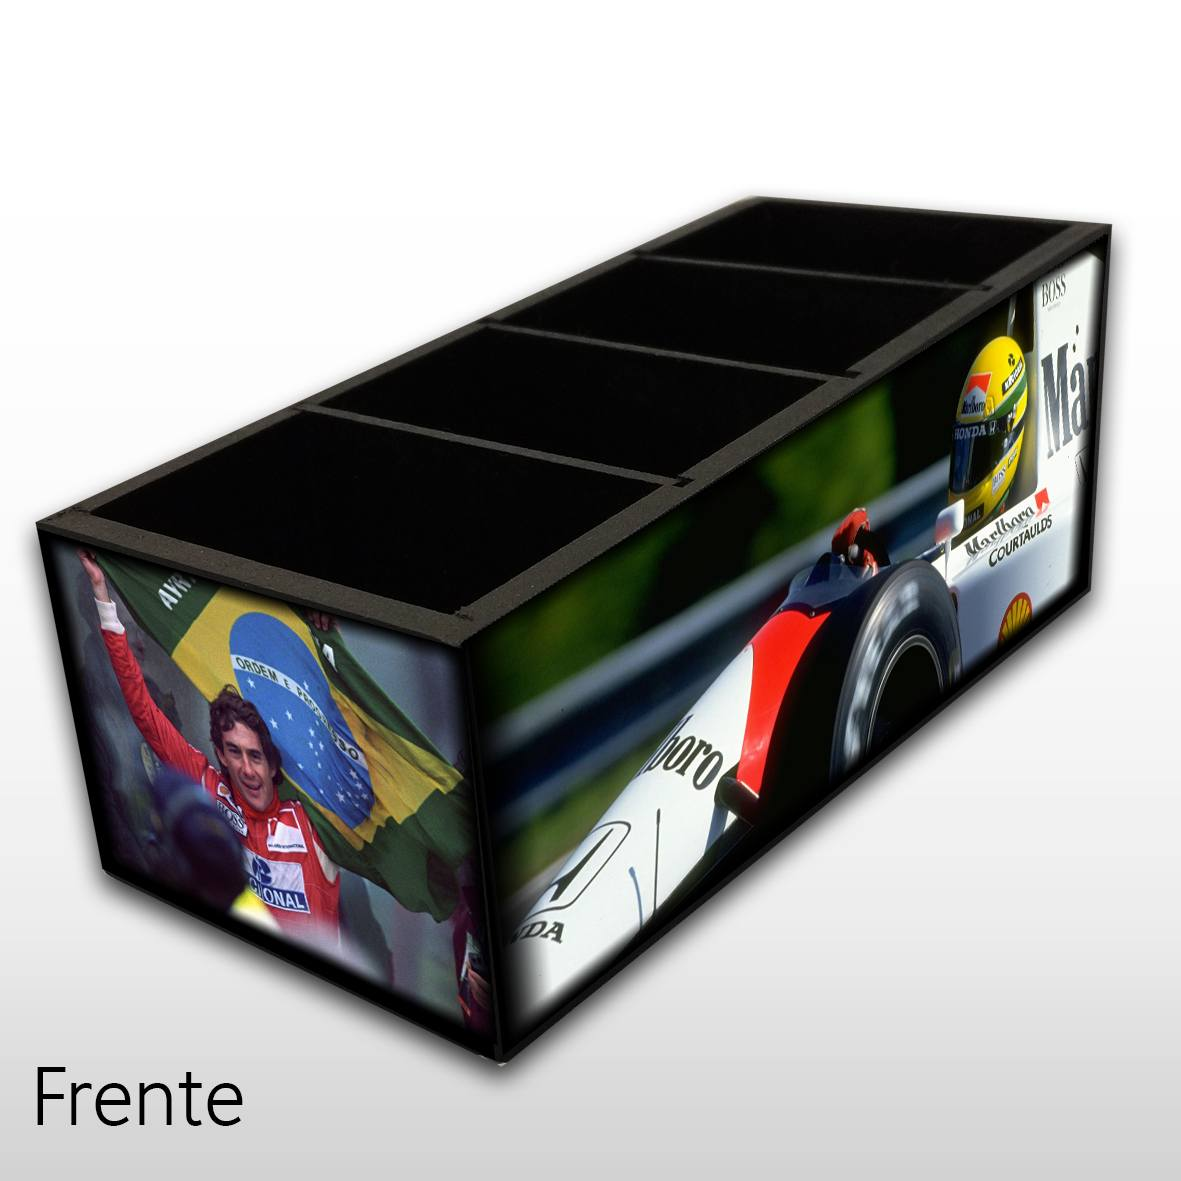 Ayrton Senna - Porta Controles MDF - 4 Espaços - Mr. Rock